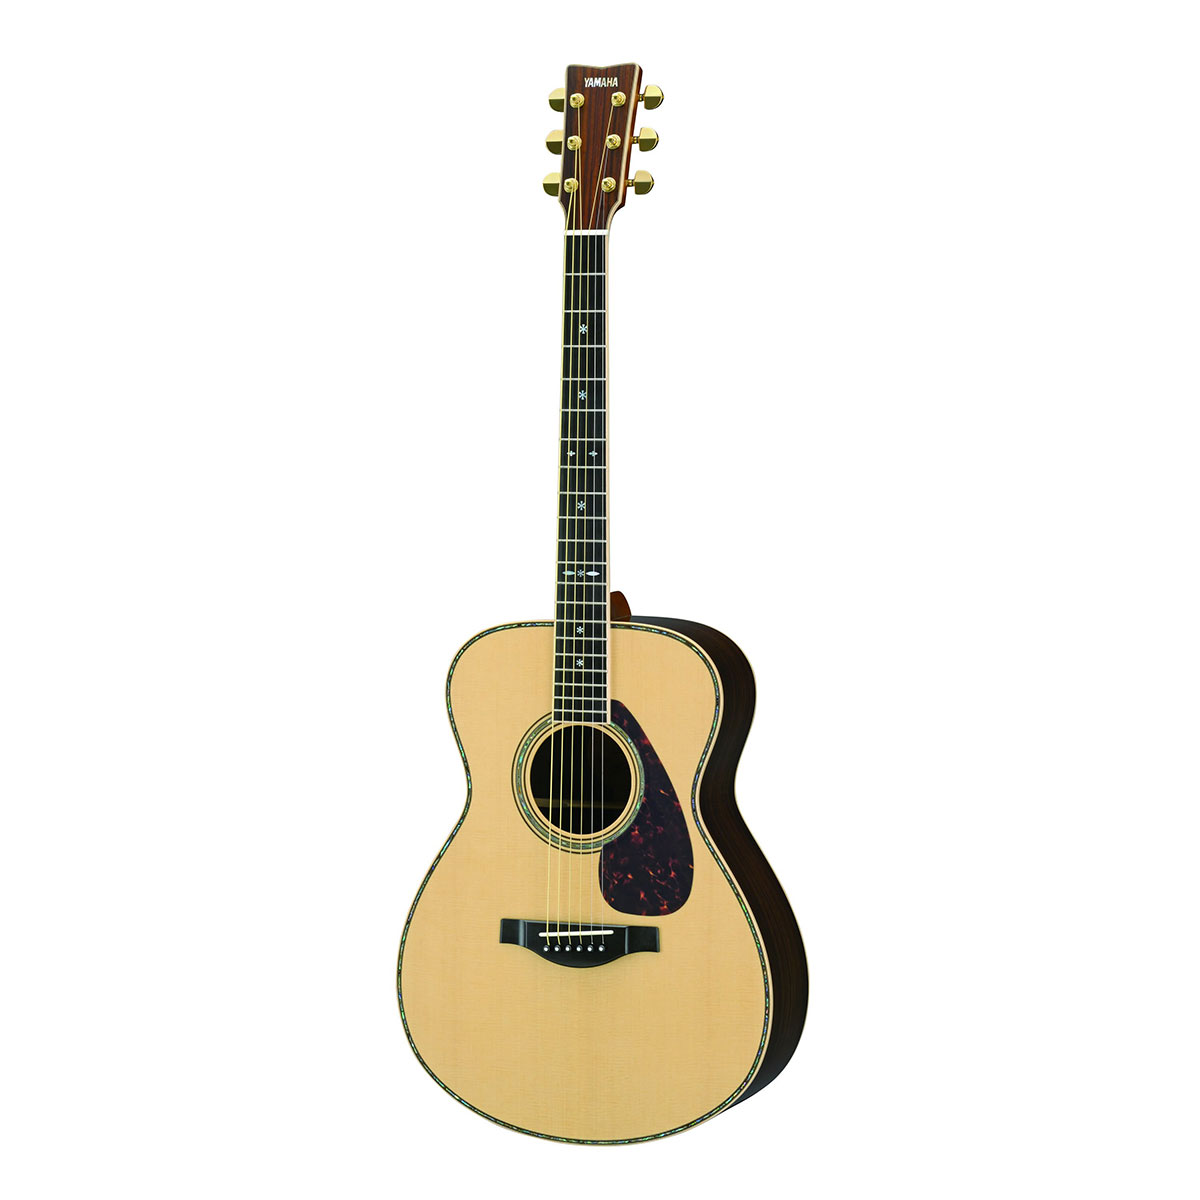 YAMAHA アコースティックギター Natural LS36 ARE ARE/ YAMAHA Natural, ヒロガワチョウ:c0dc42f4 --- sunward.msk.ru